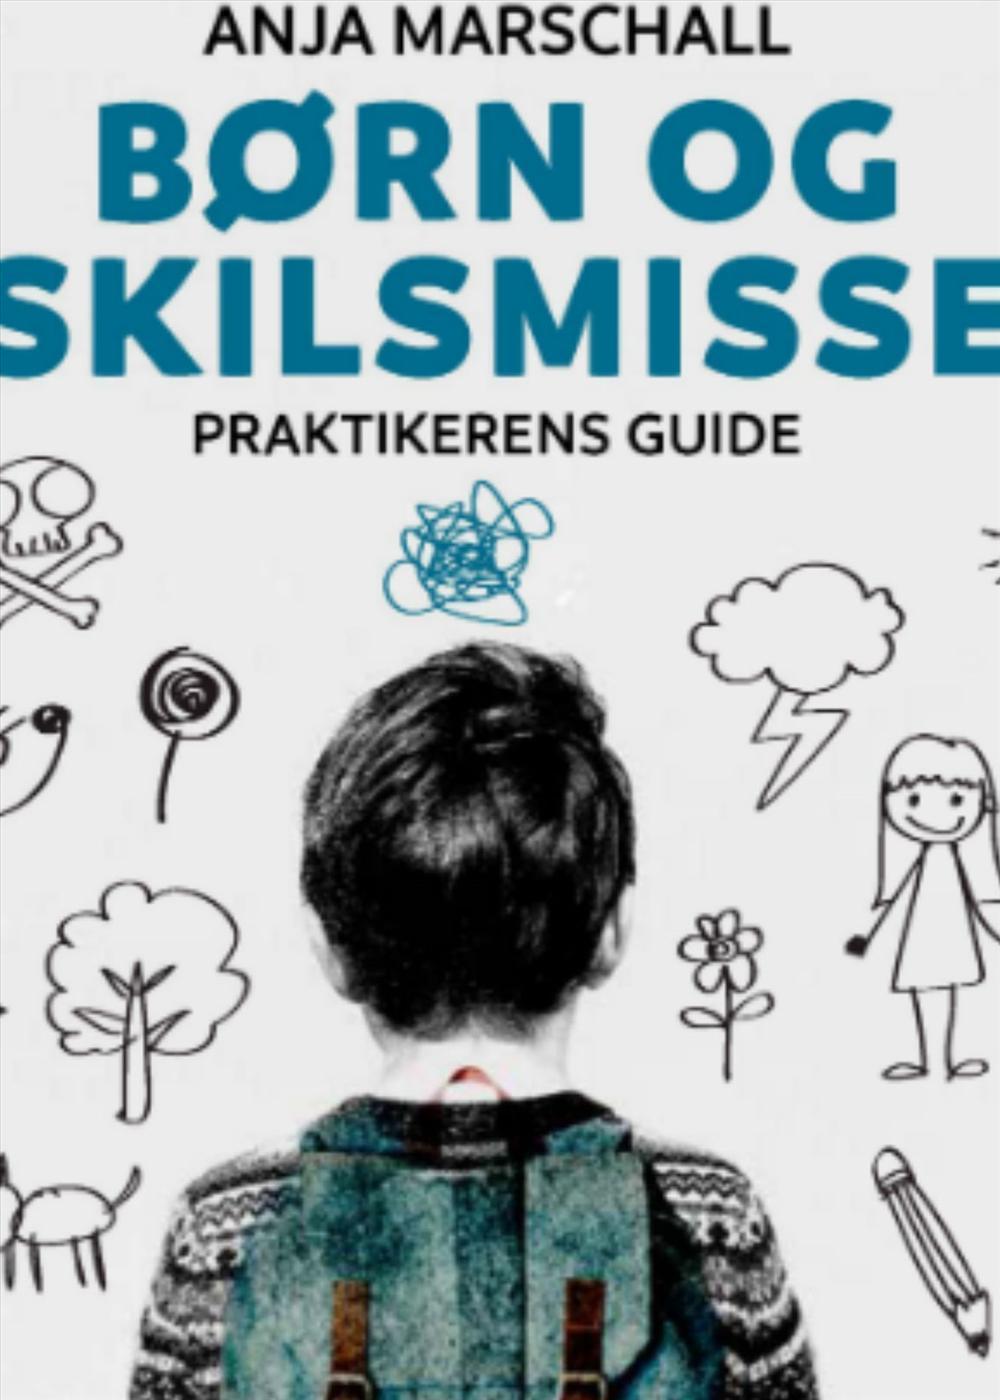 Børn og skilsmisse - Anja Marschall - Bøger - Samfundslitteratur - 9788759329061 - 15/12-2016